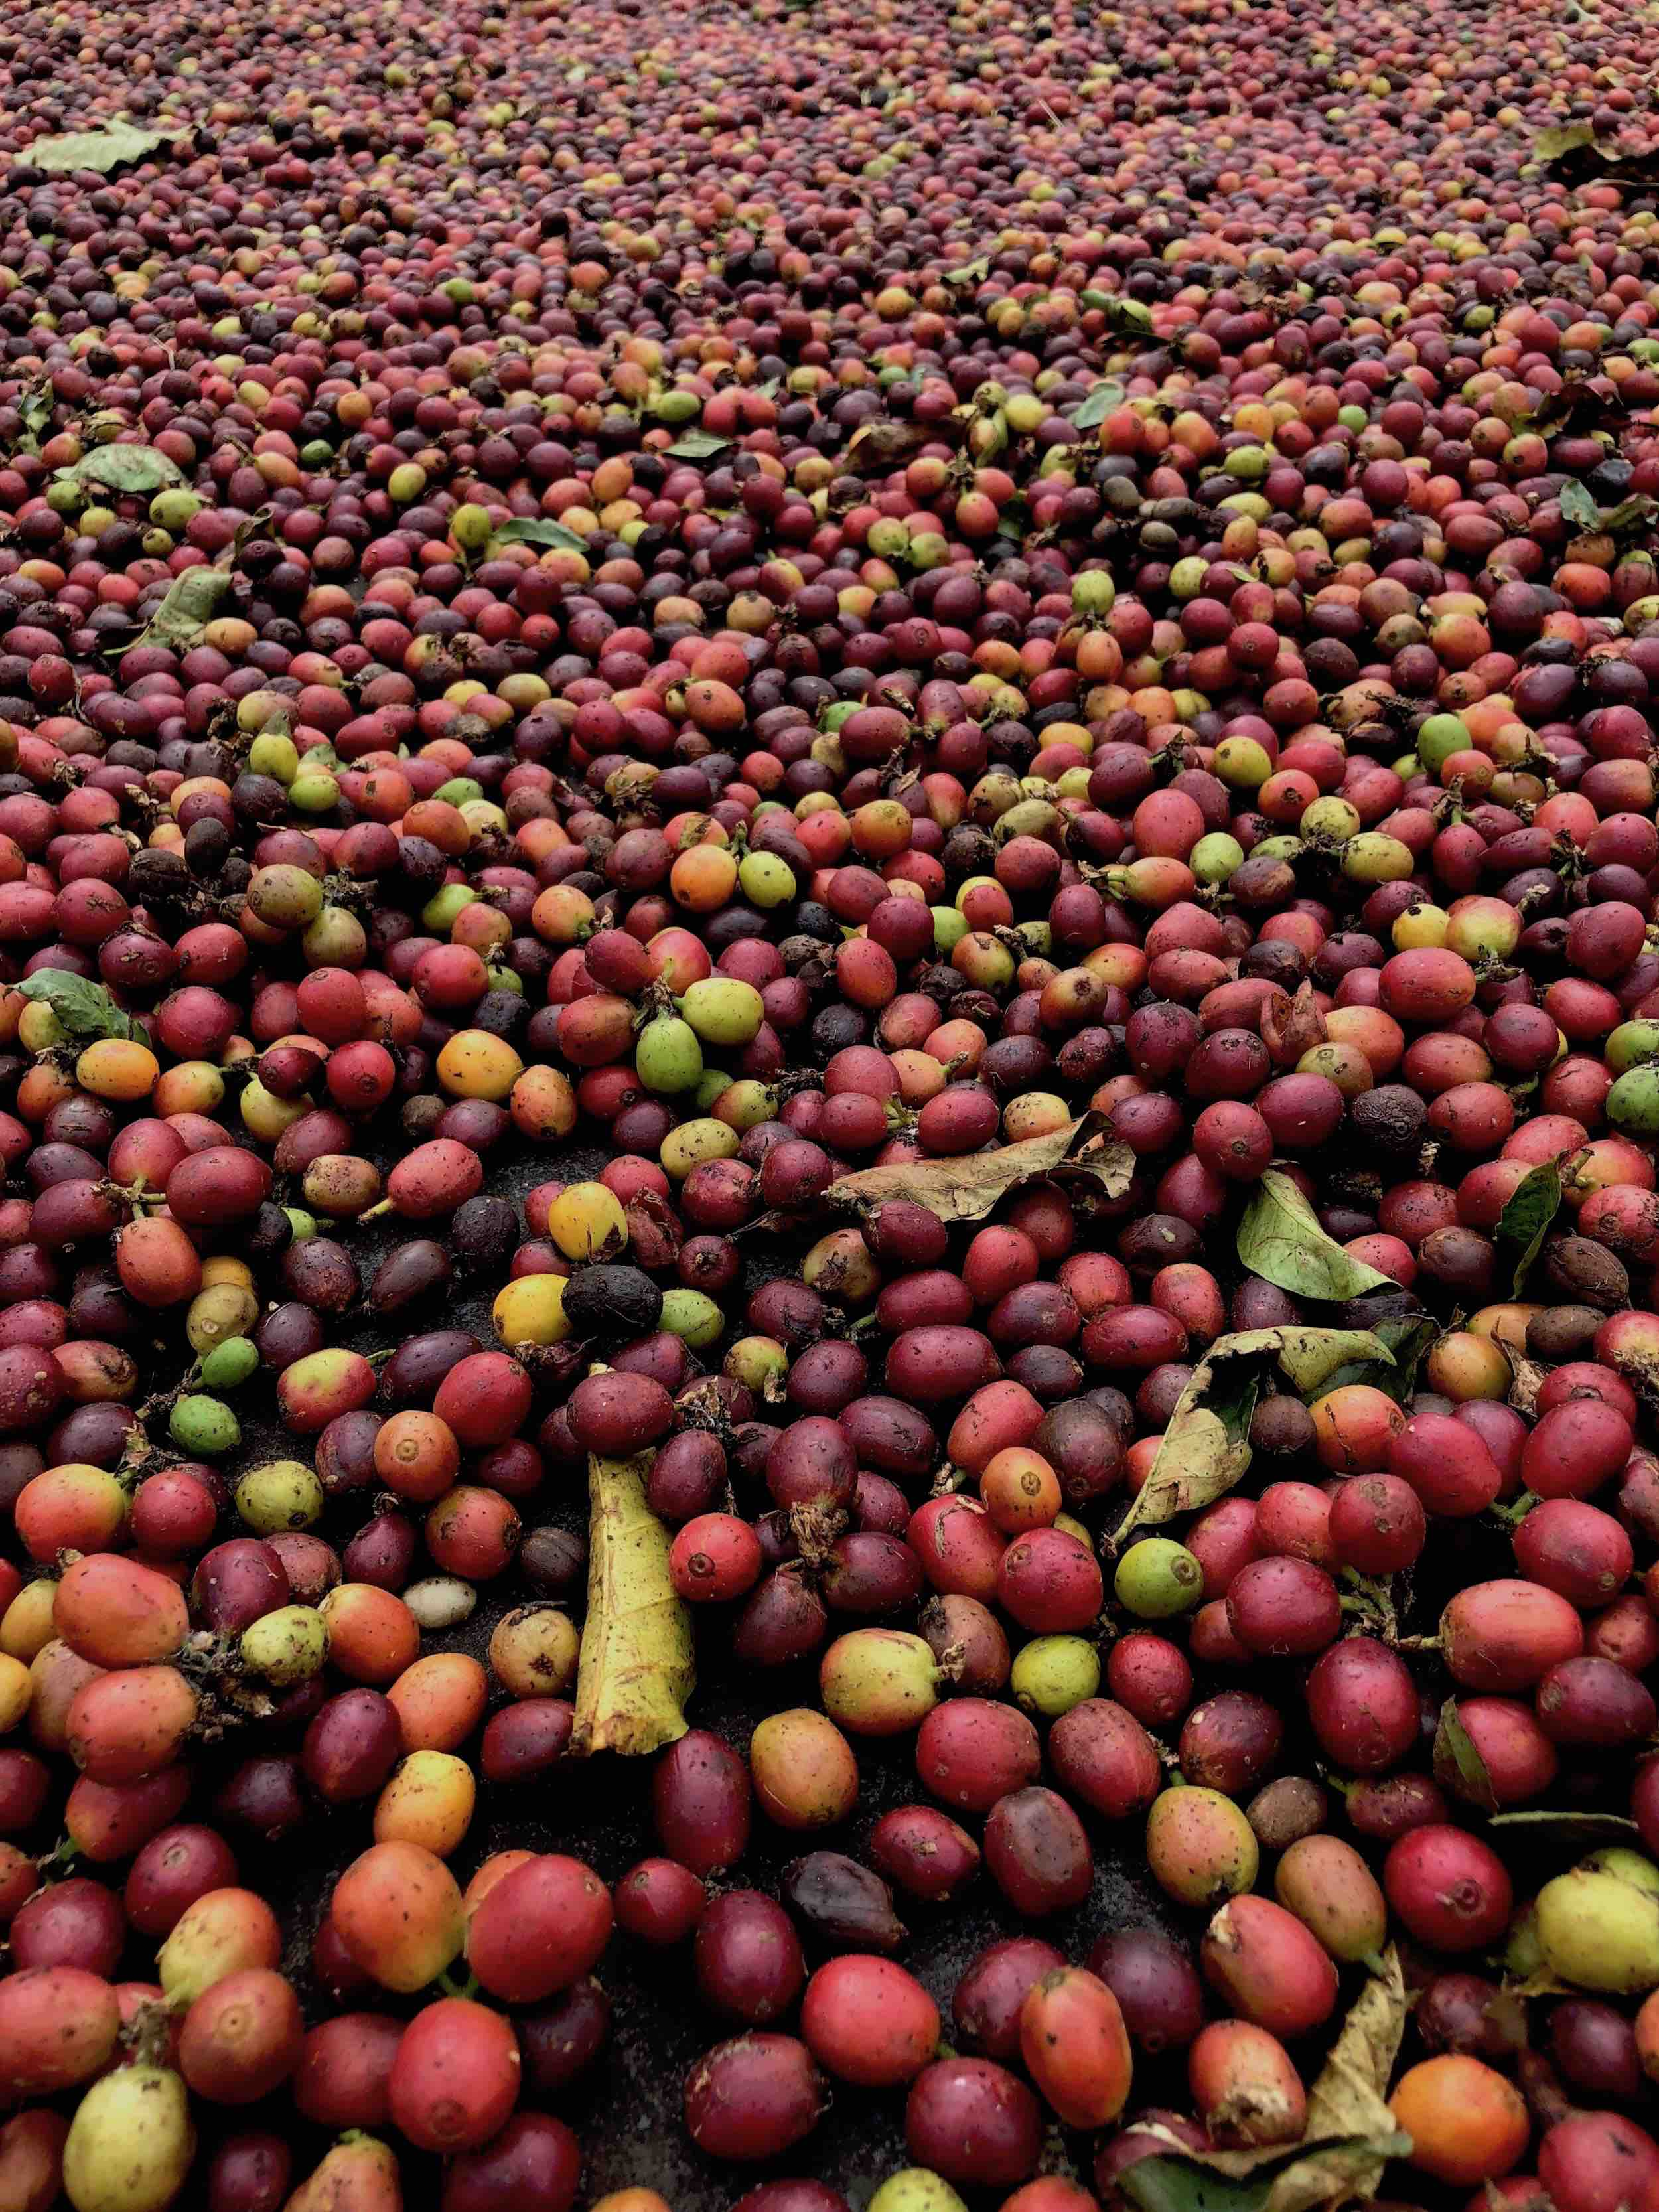 Freshly picked coffee berries from Kona coffee plantations.